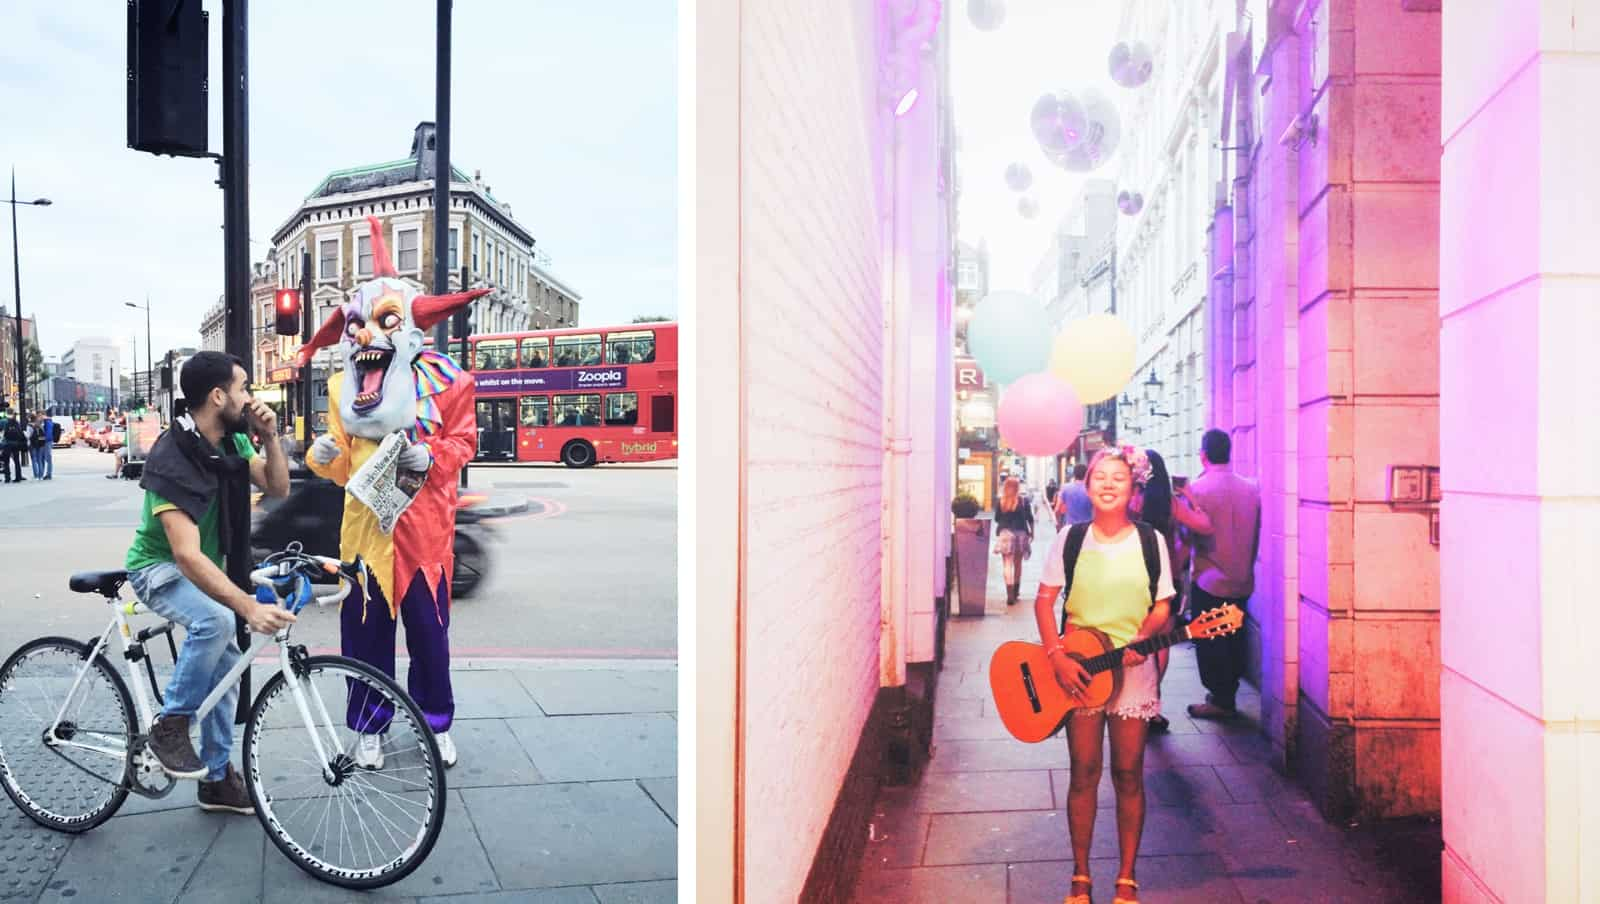 London clown